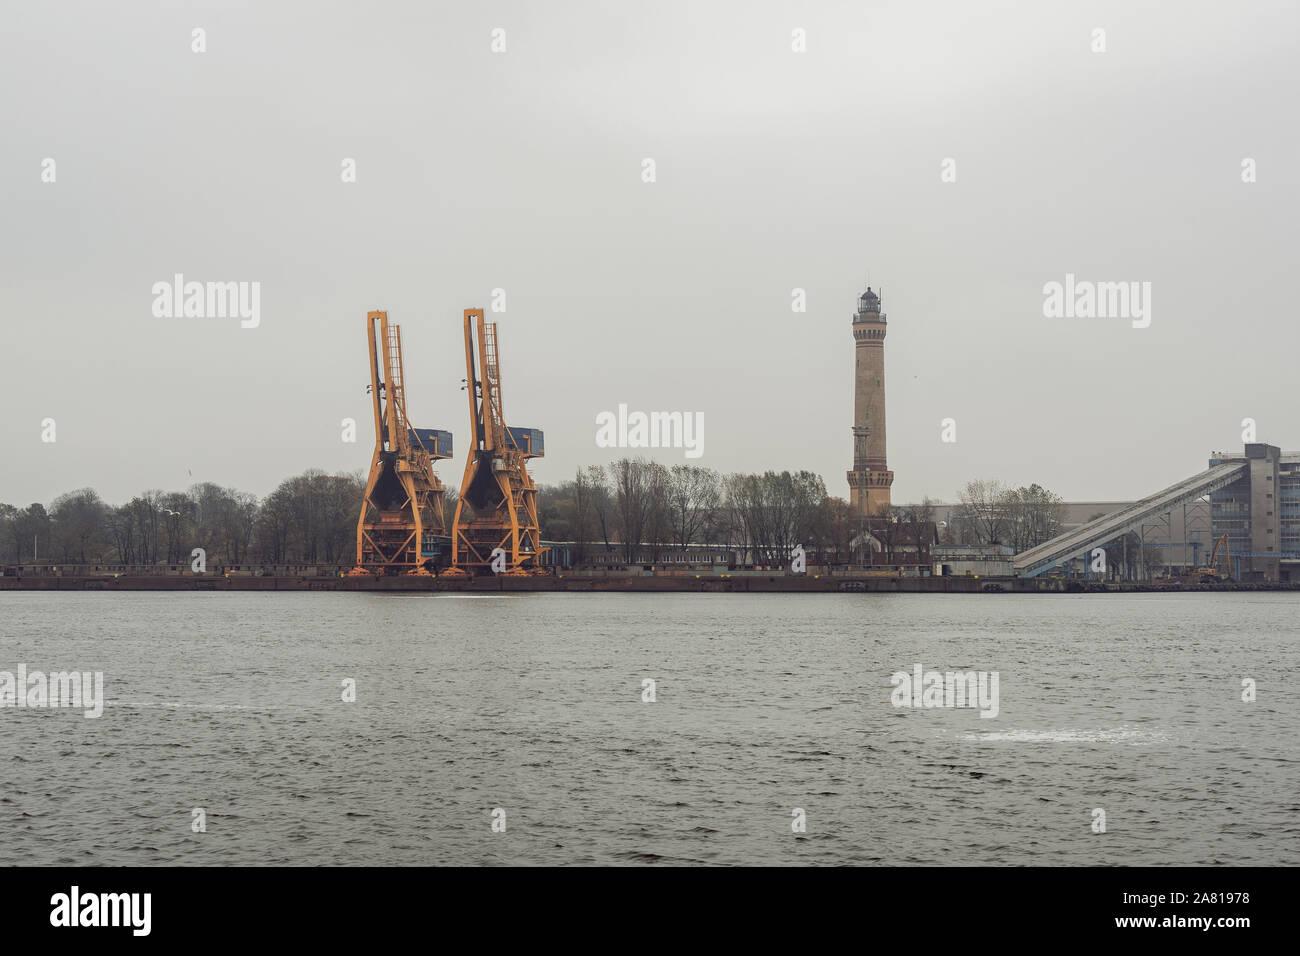 Photography of a logistics/cargo shipyard. Swinoujscie, Poland. Stock Photo